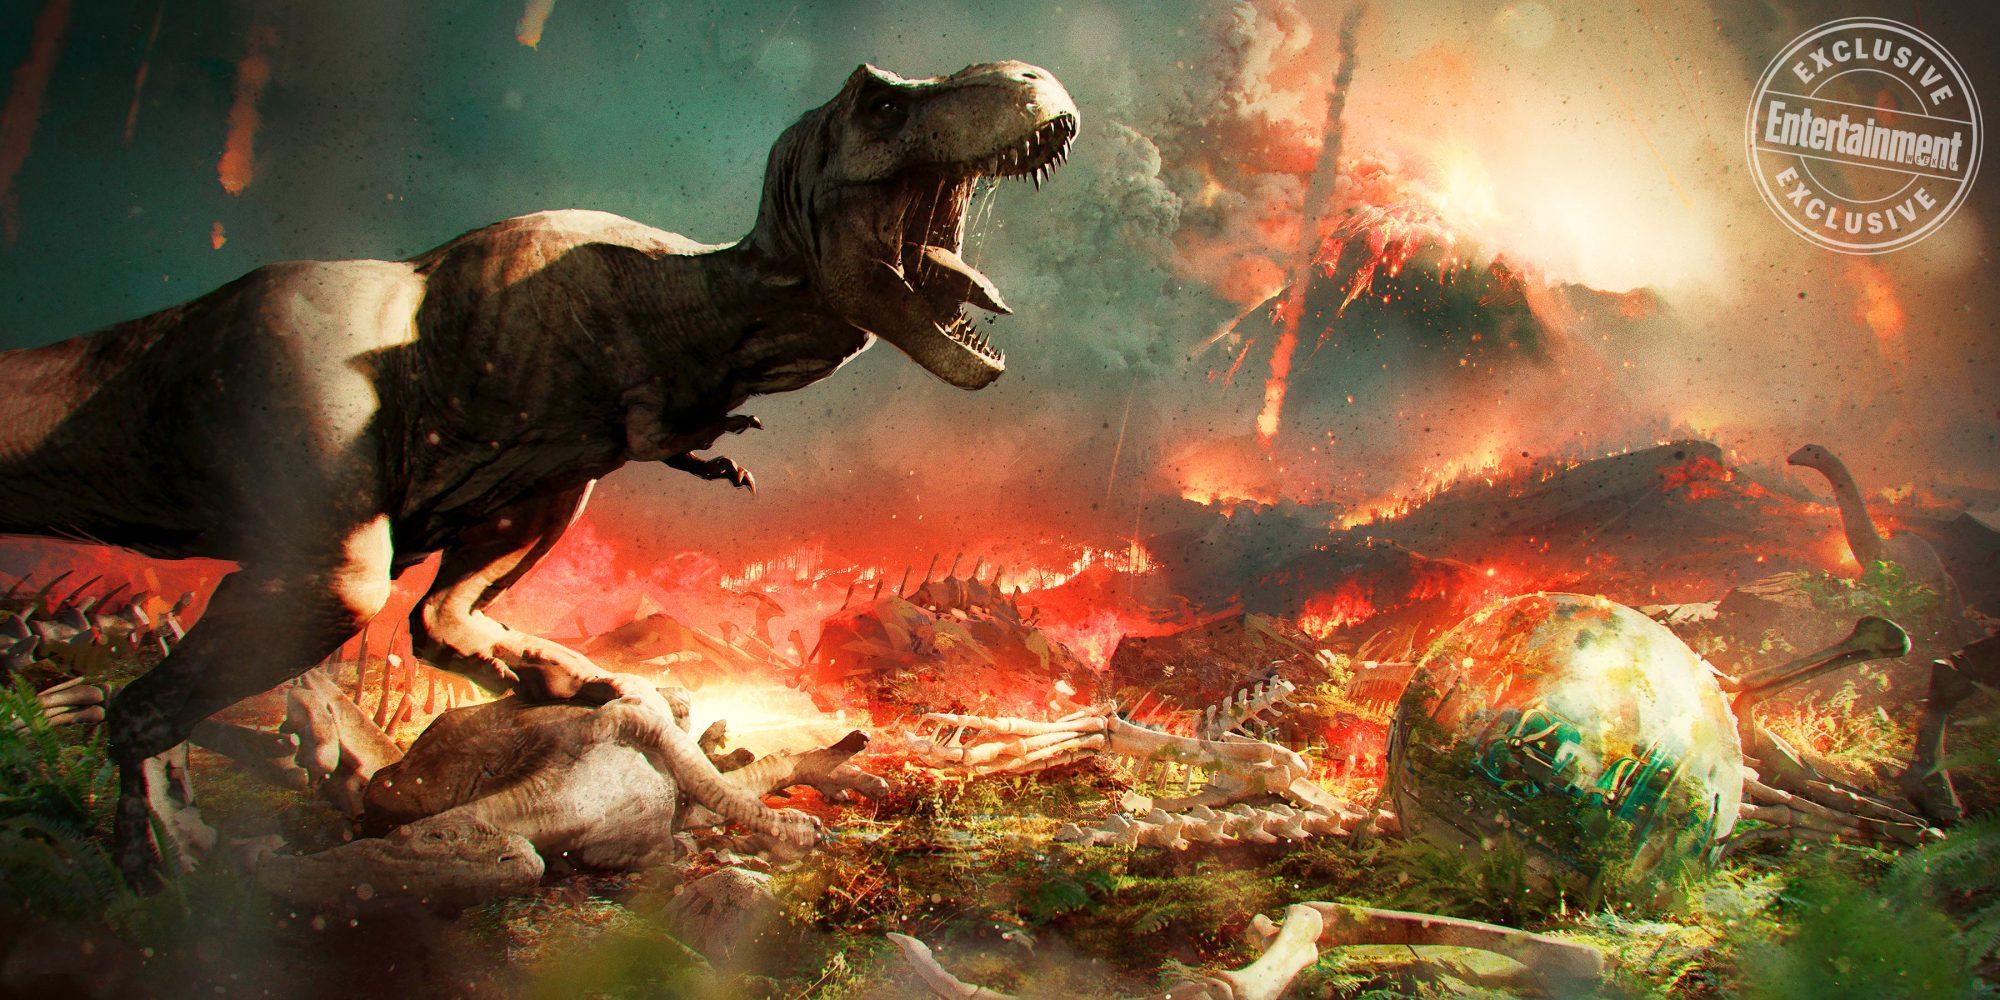 Jurassic Park: Fallen Kingdom (2018) concept art